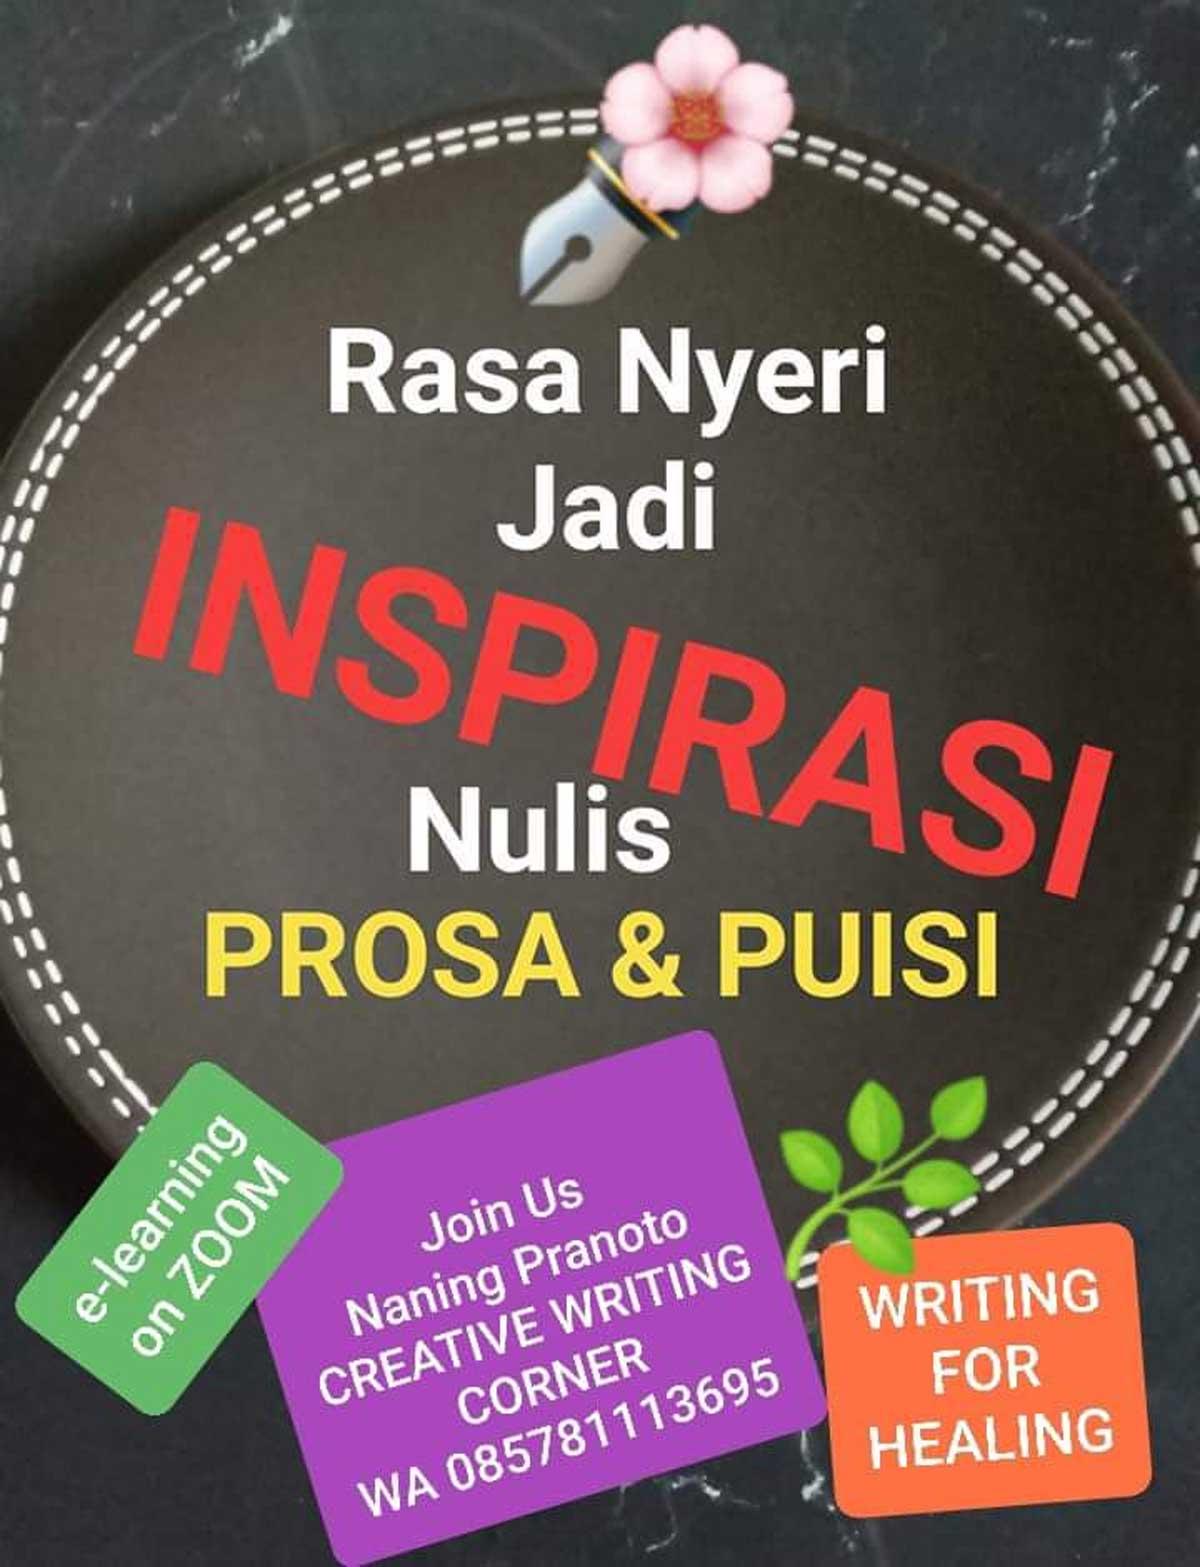 Inspirasi Nulis Prosa dan Puisi